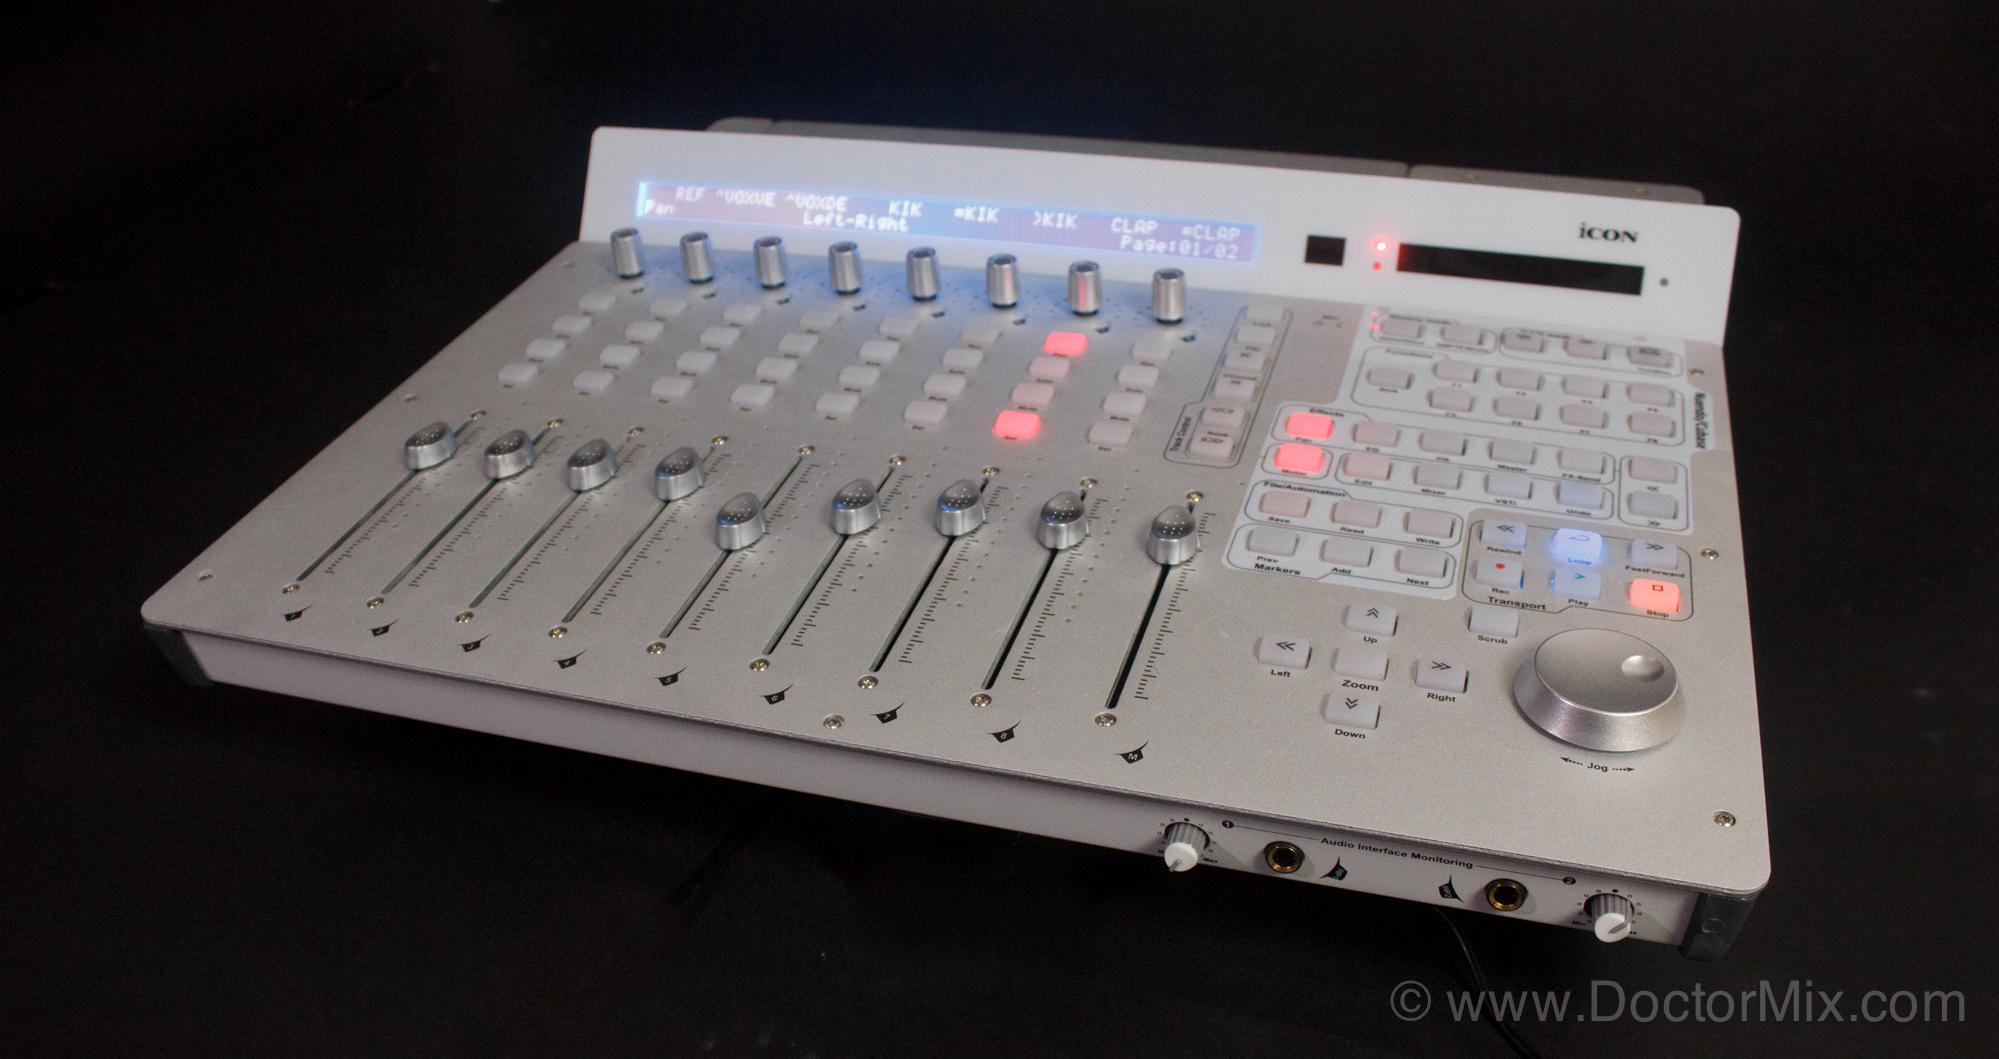 Production Mixing Mastering Pdf Icon Qcon Pro